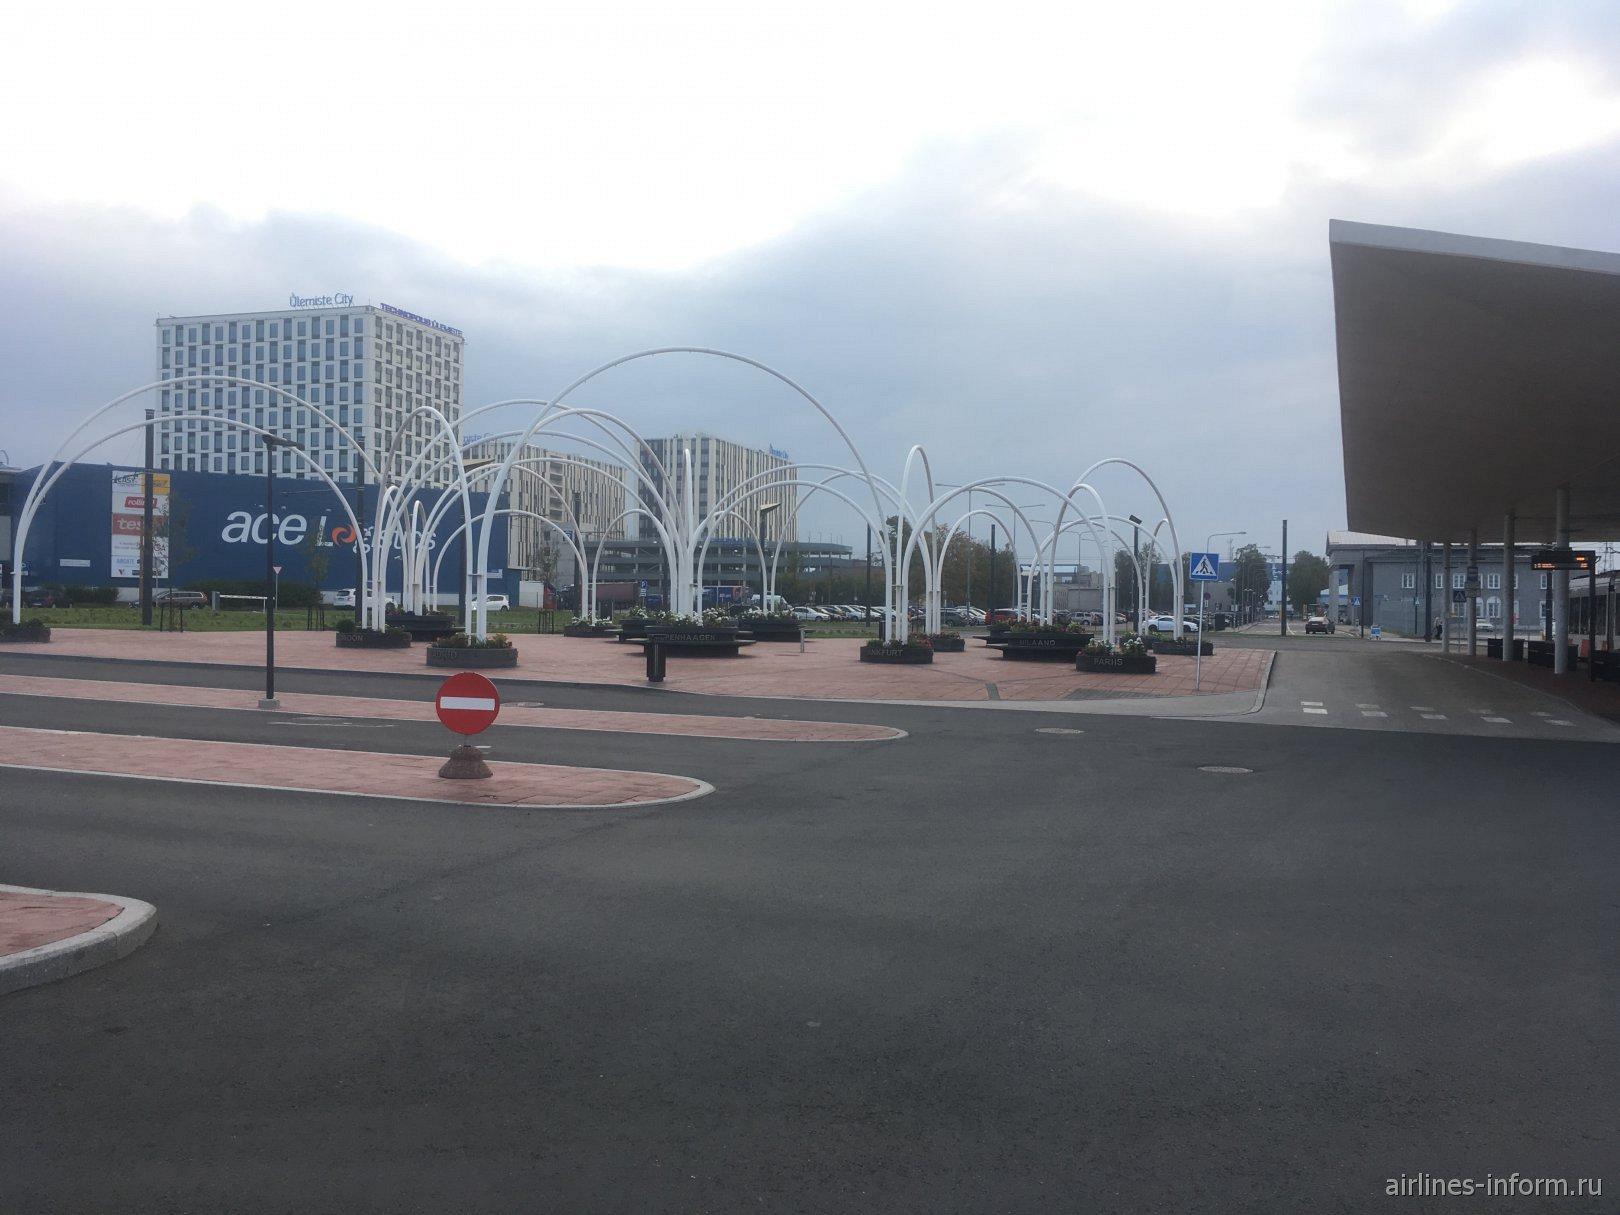 Привокзальная площадь и вид на бизнес сити в аэропорту Таллин